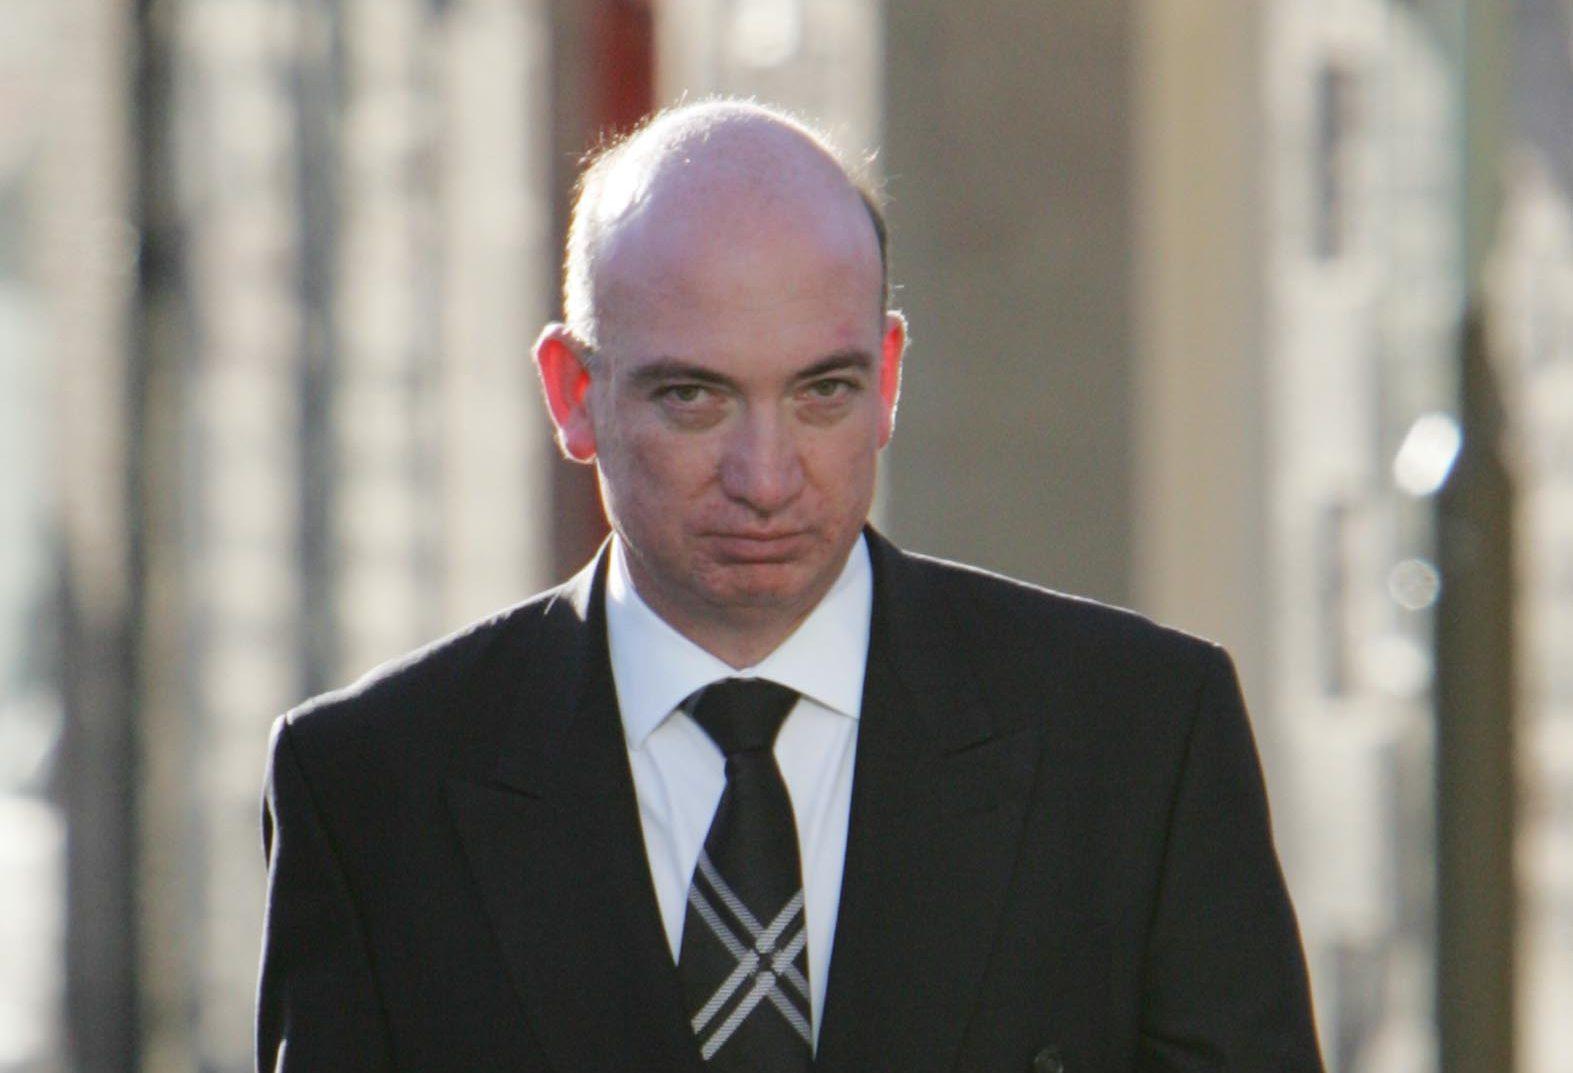 Lord Battenberg